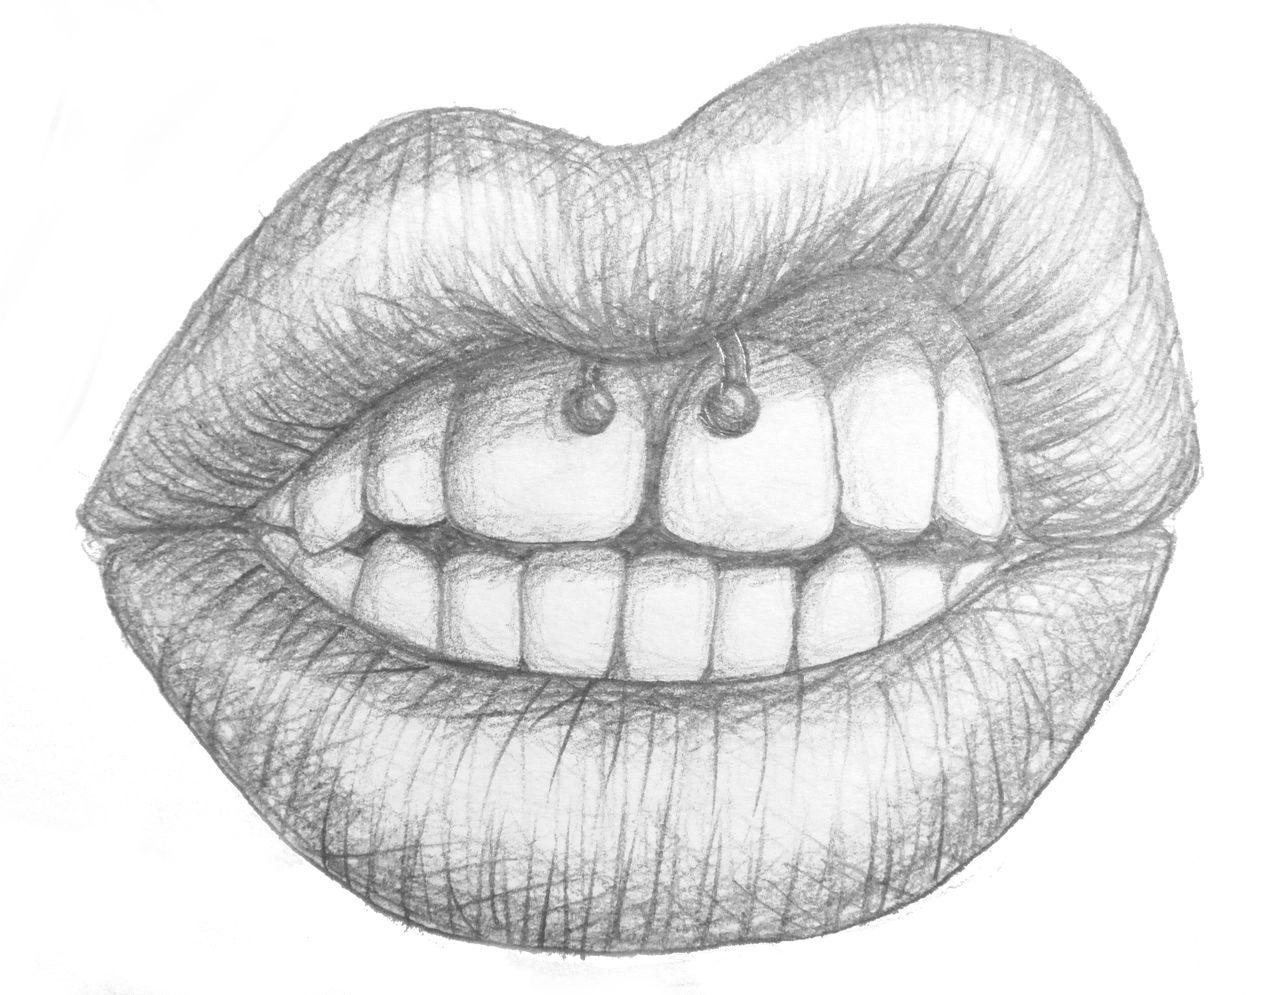 Disegni E Disegni Labbra Tumblr Art Schizzi Facili